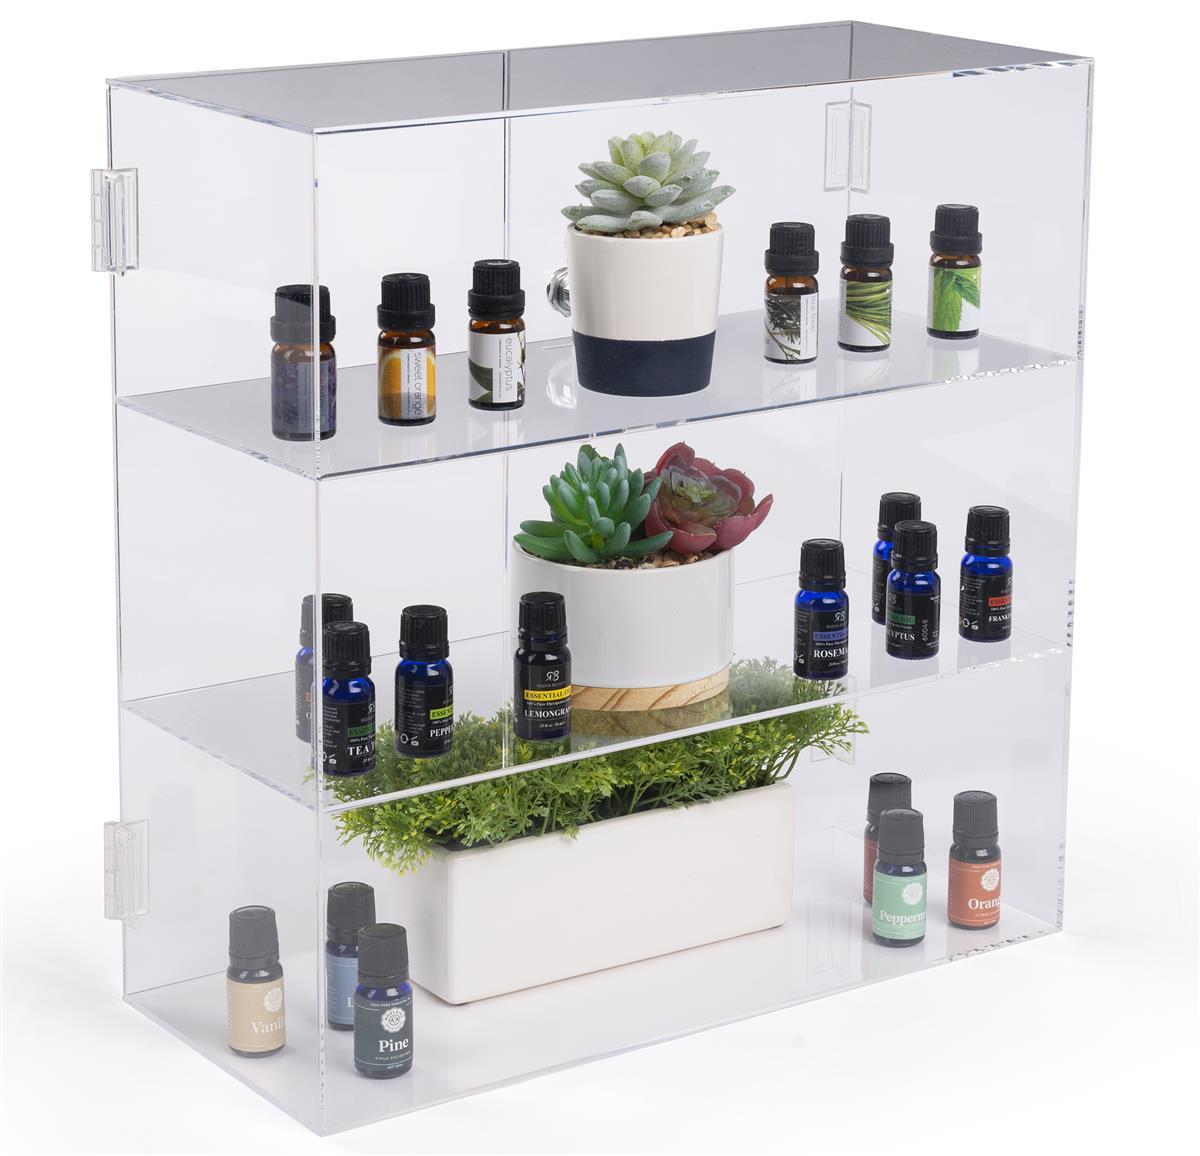 Acrylic Display Case - Hinged Doors & 2 Shelves